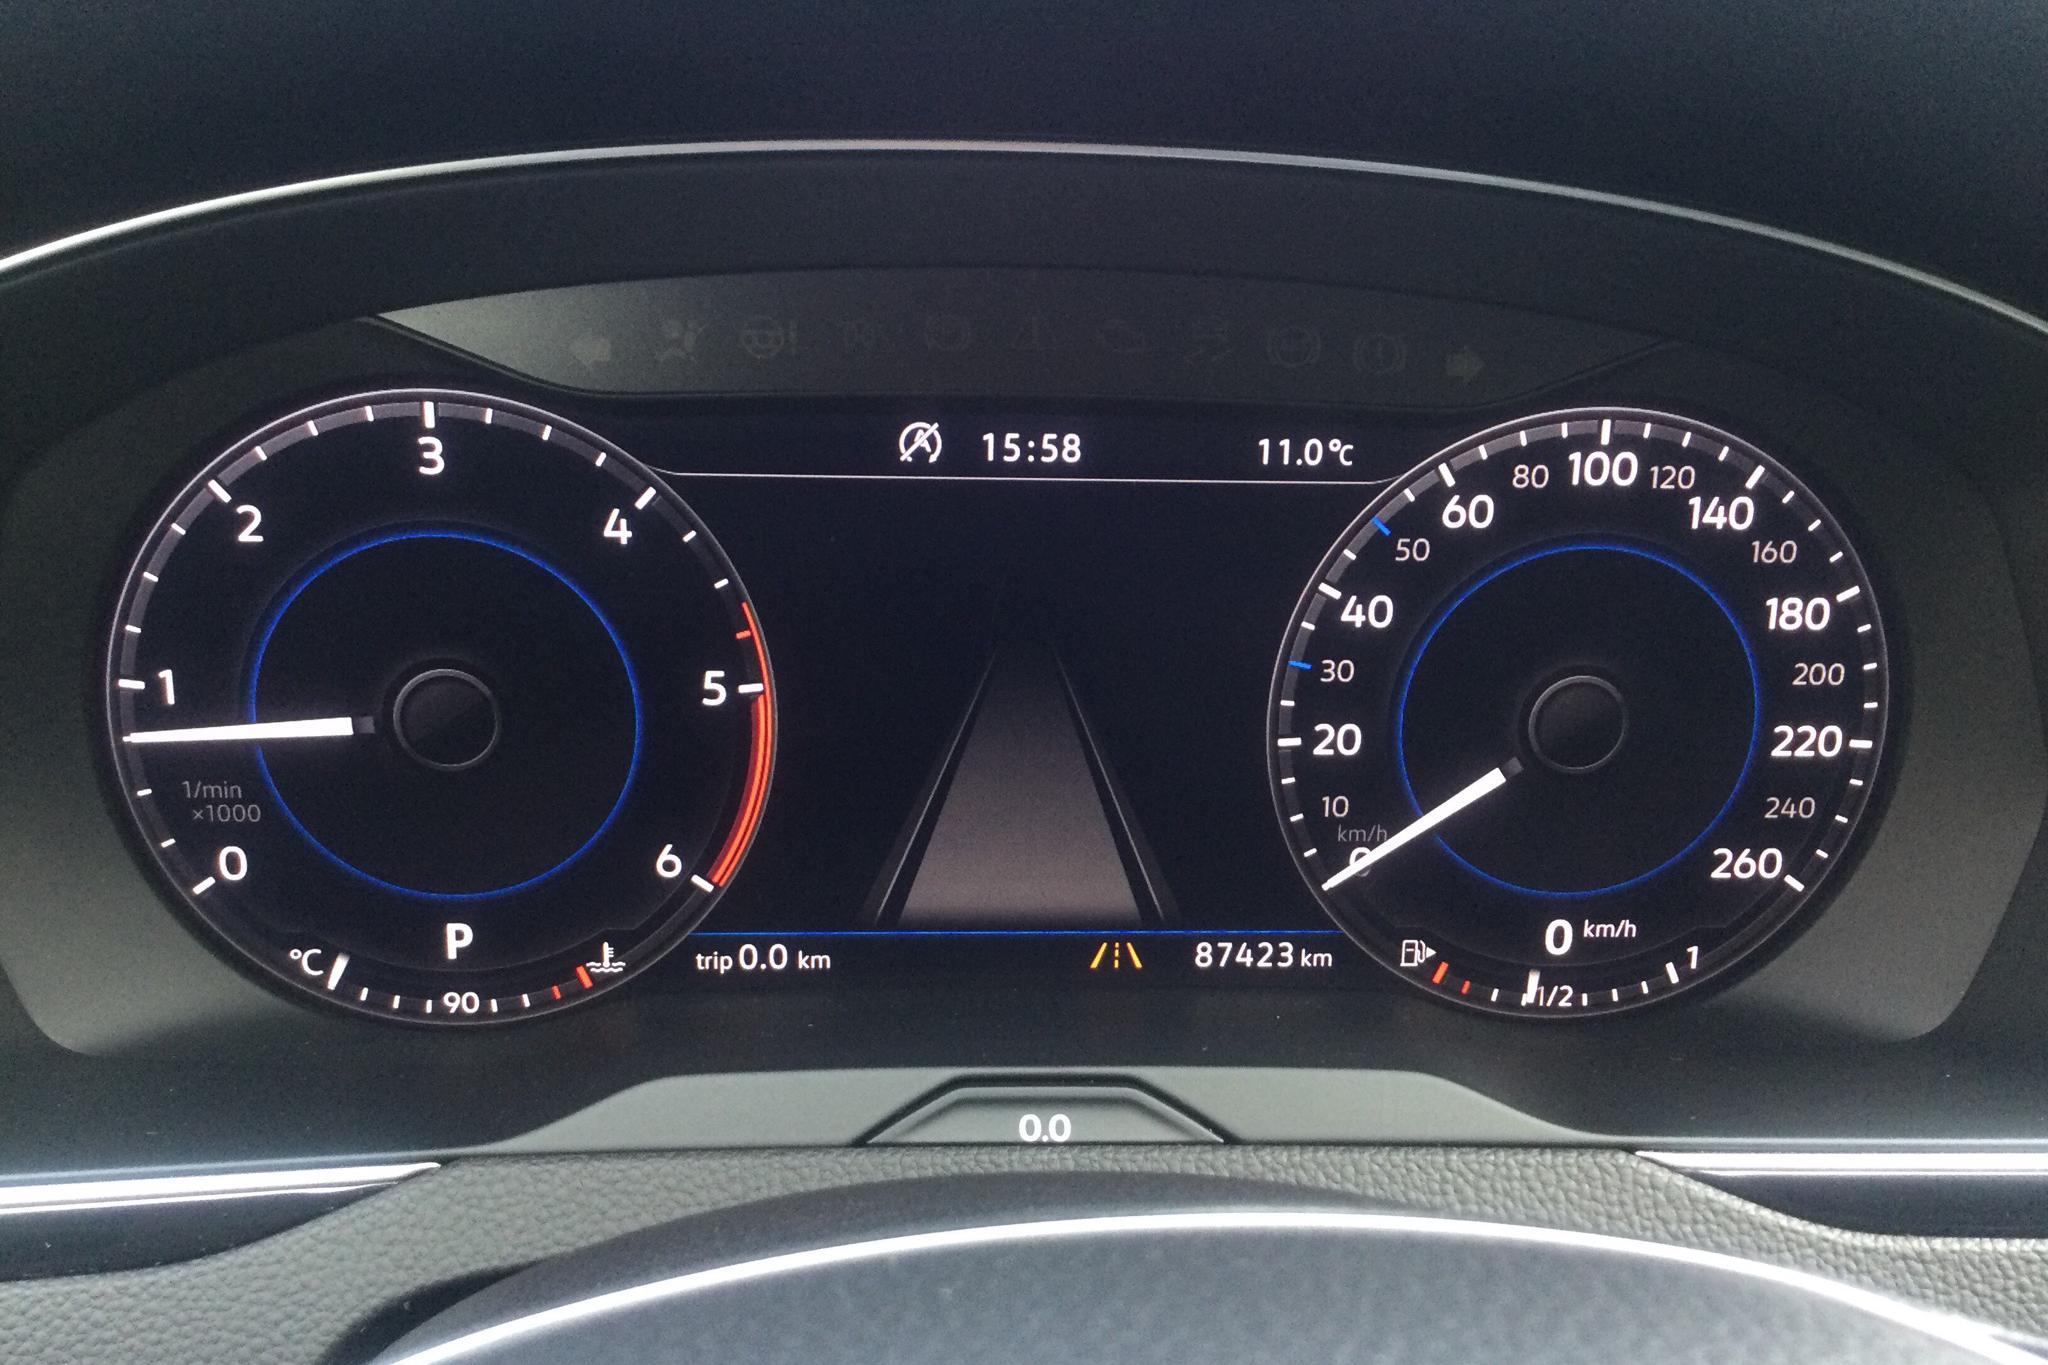 VW Passat 2.0 TDI Sportscombi 4MOTION (190hk) - 8 742 mil - Automat - svart - 2018